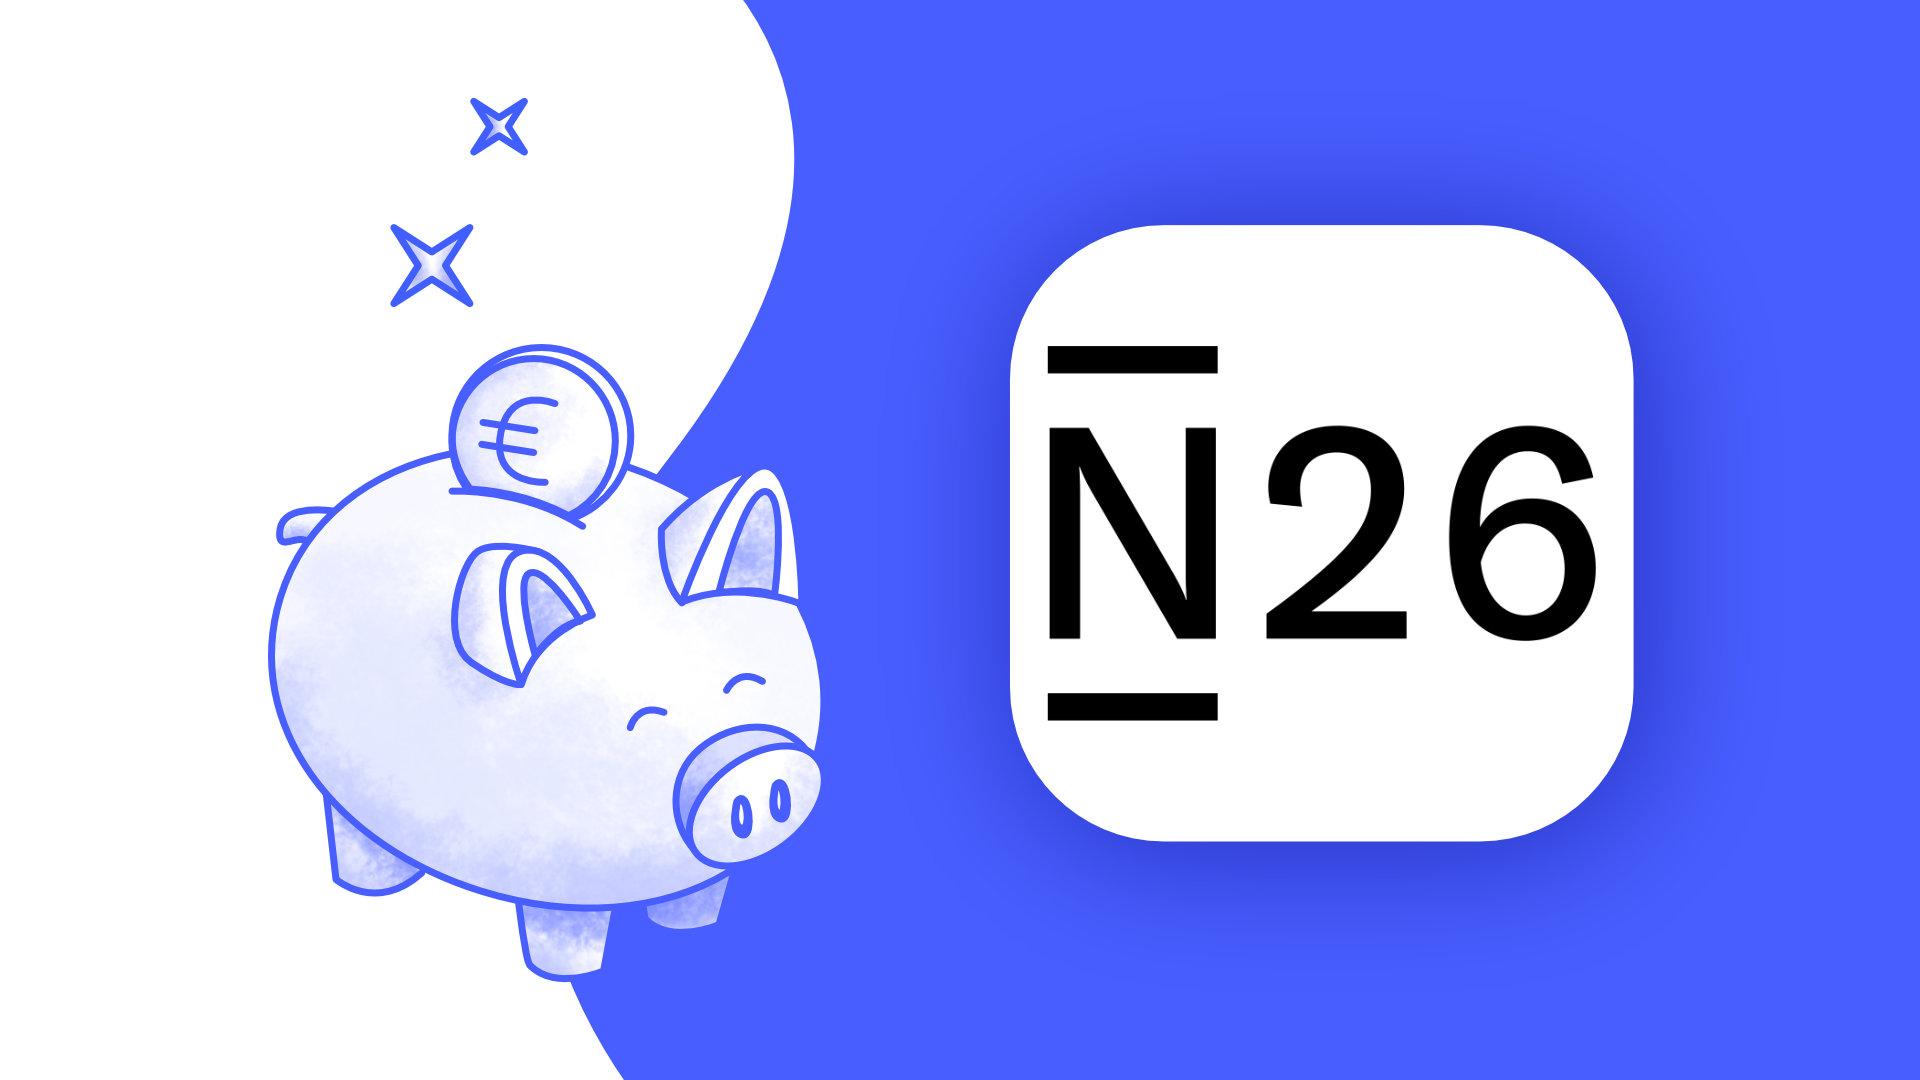 Avis N26 : que valent les services de la néobanque en 2021 ?